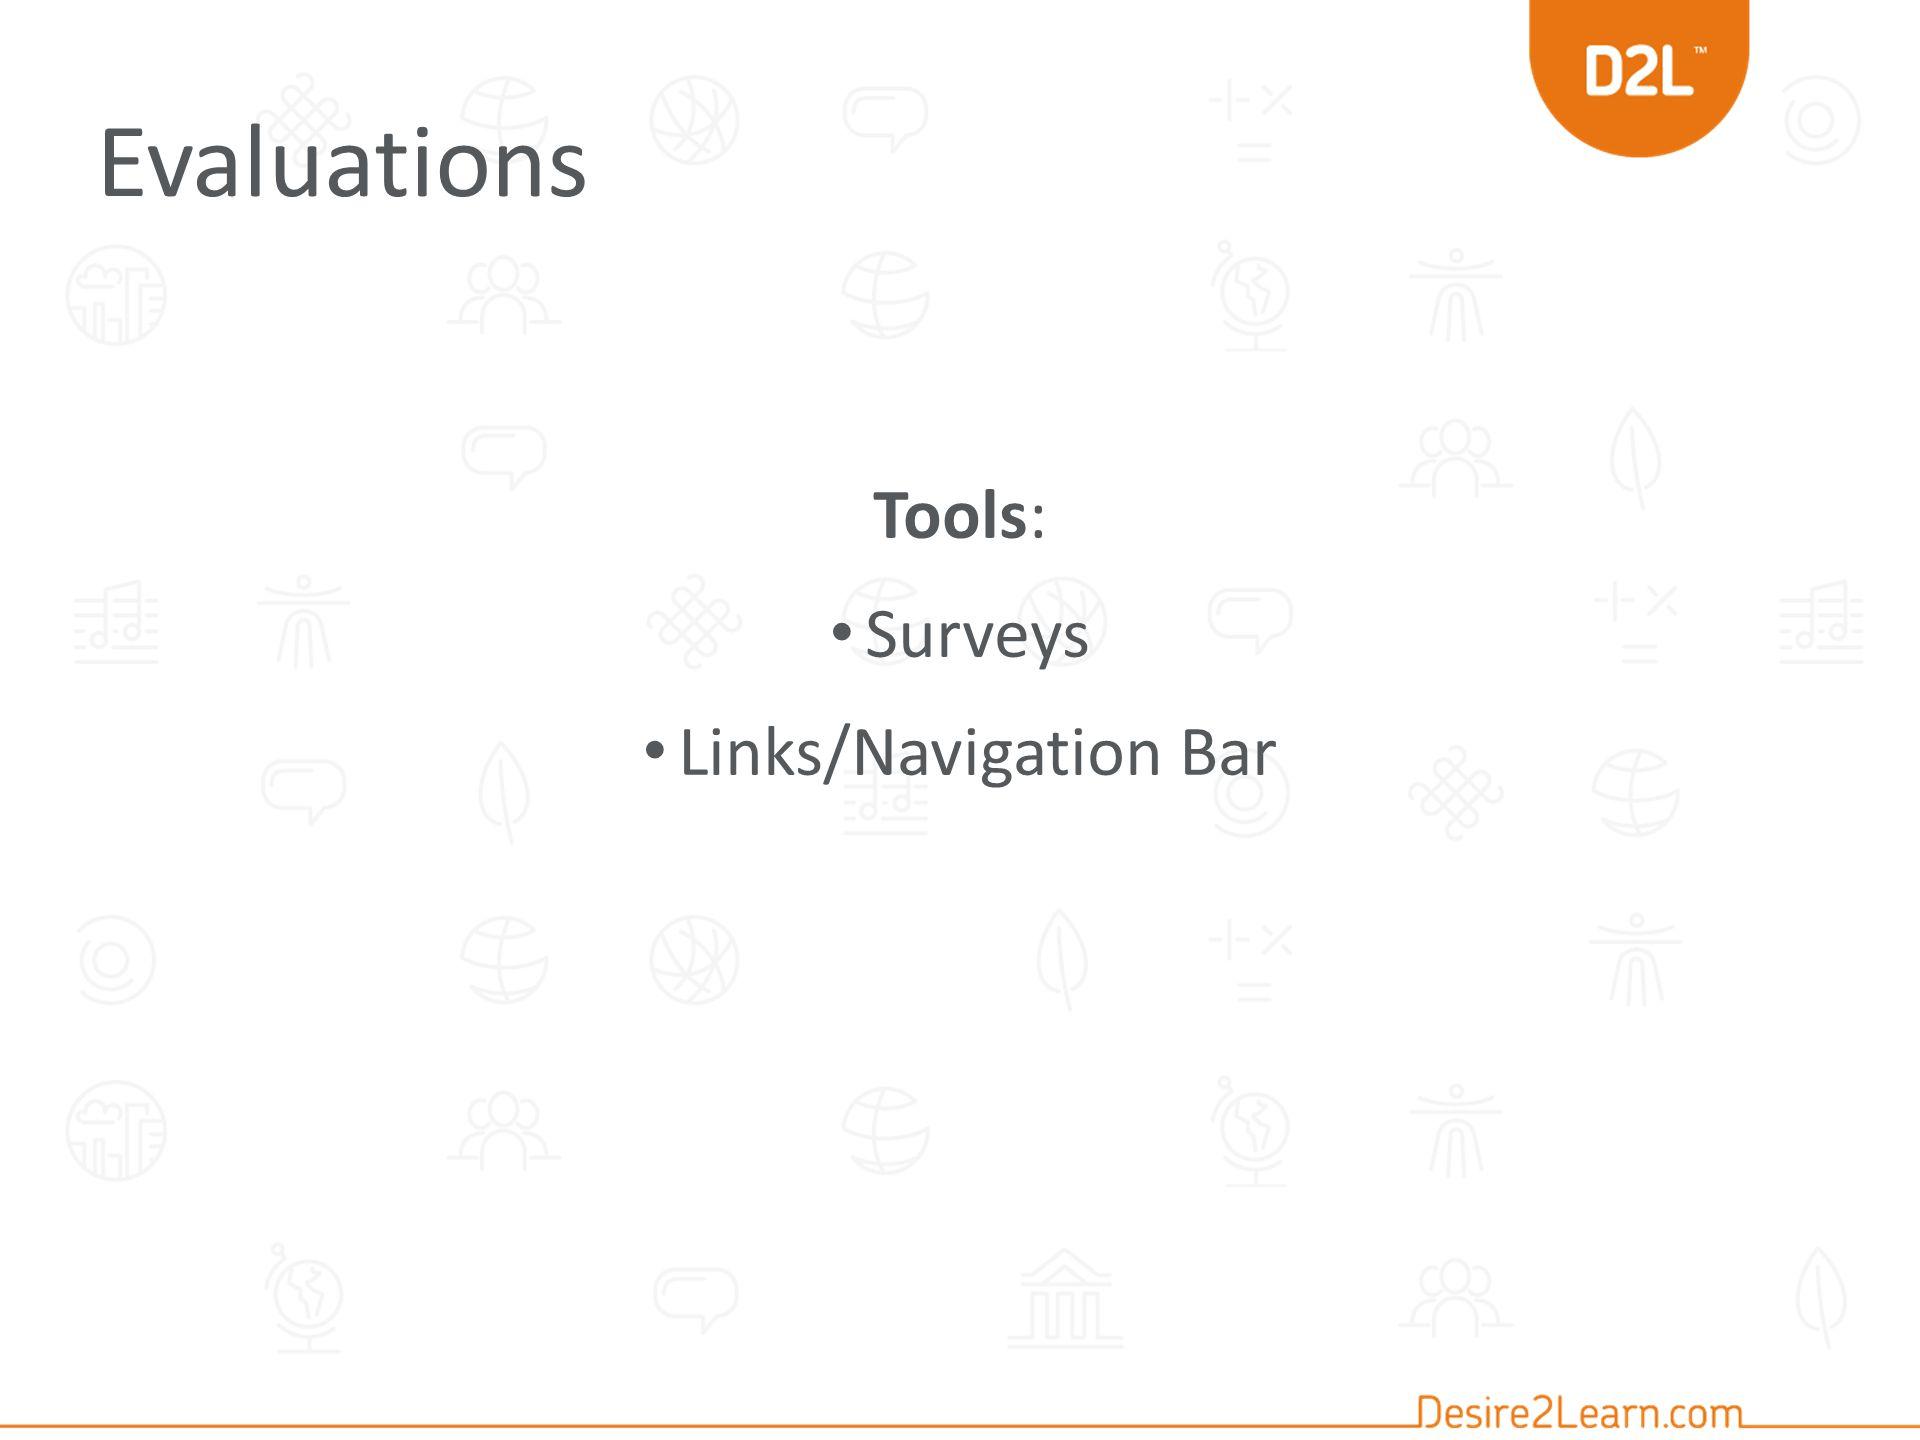 Evaluations Tools: Surveys Links/Navigation Bar